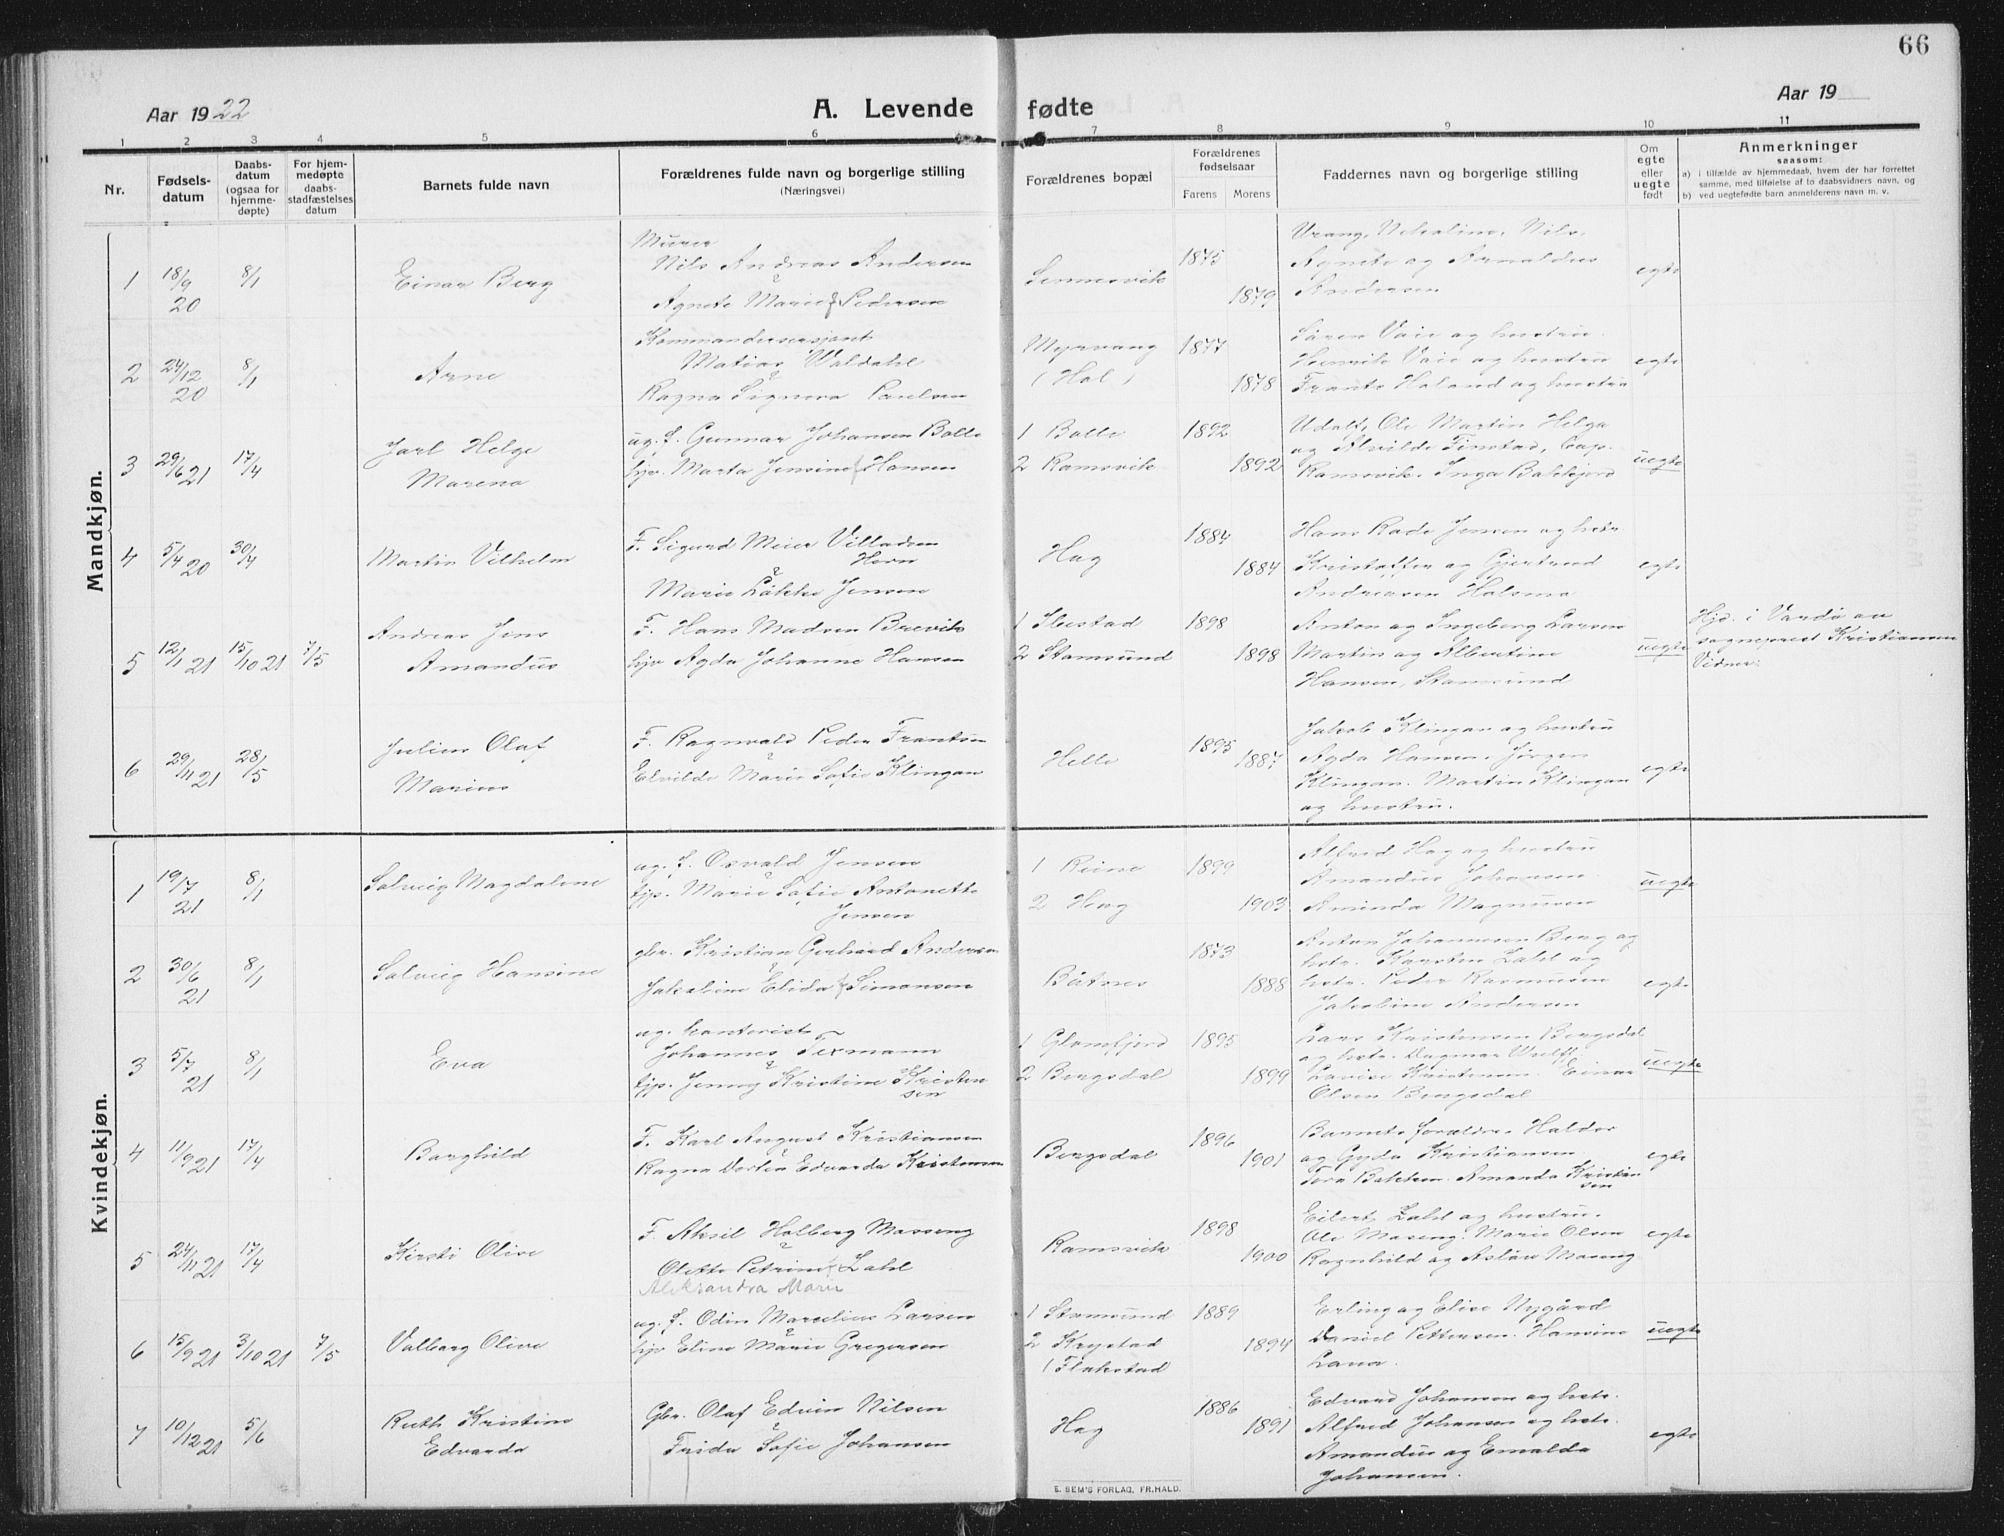 SAT, Ministerialprotokoller, klokkerbøker og fødselsregistre - Nordland, 882/L1183: Klokkerbok nr. 882C01, 1911-1938, s. 66